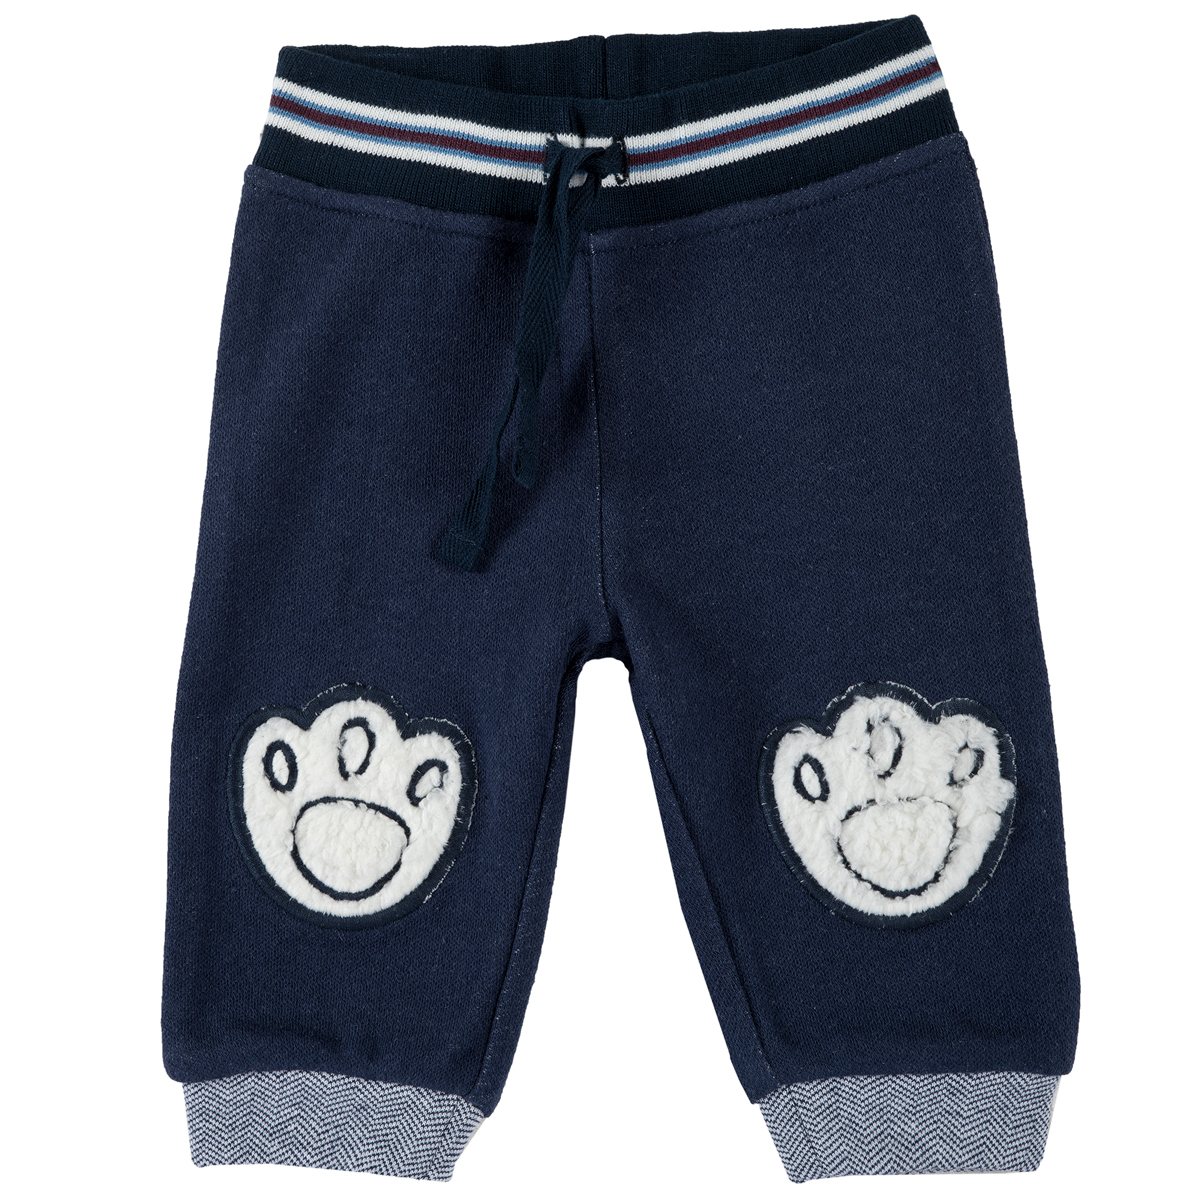 Pantaloni lungi sport copii Chicco, manseta elastica, 08021 din categoria Pantaloni copii